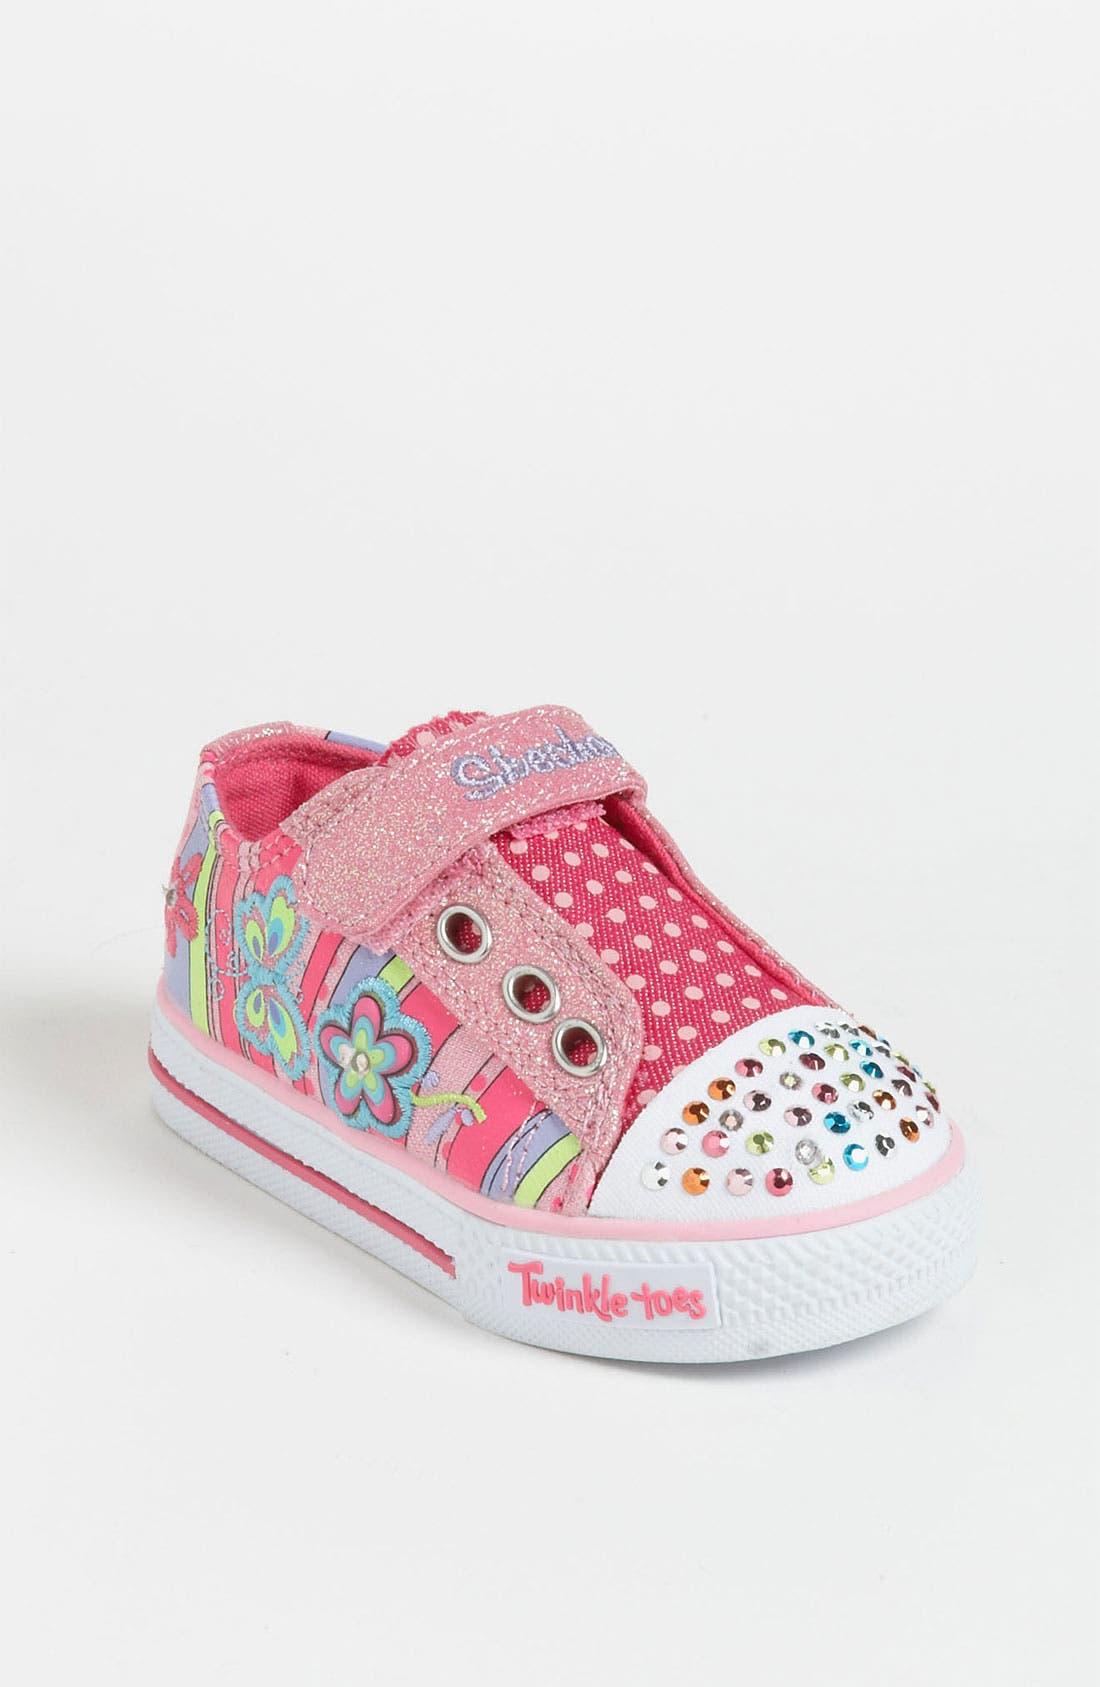 Main Image - SKECHERS 'Twinkle Toes - Shuffles' Sneaker (Walker & Toddler)